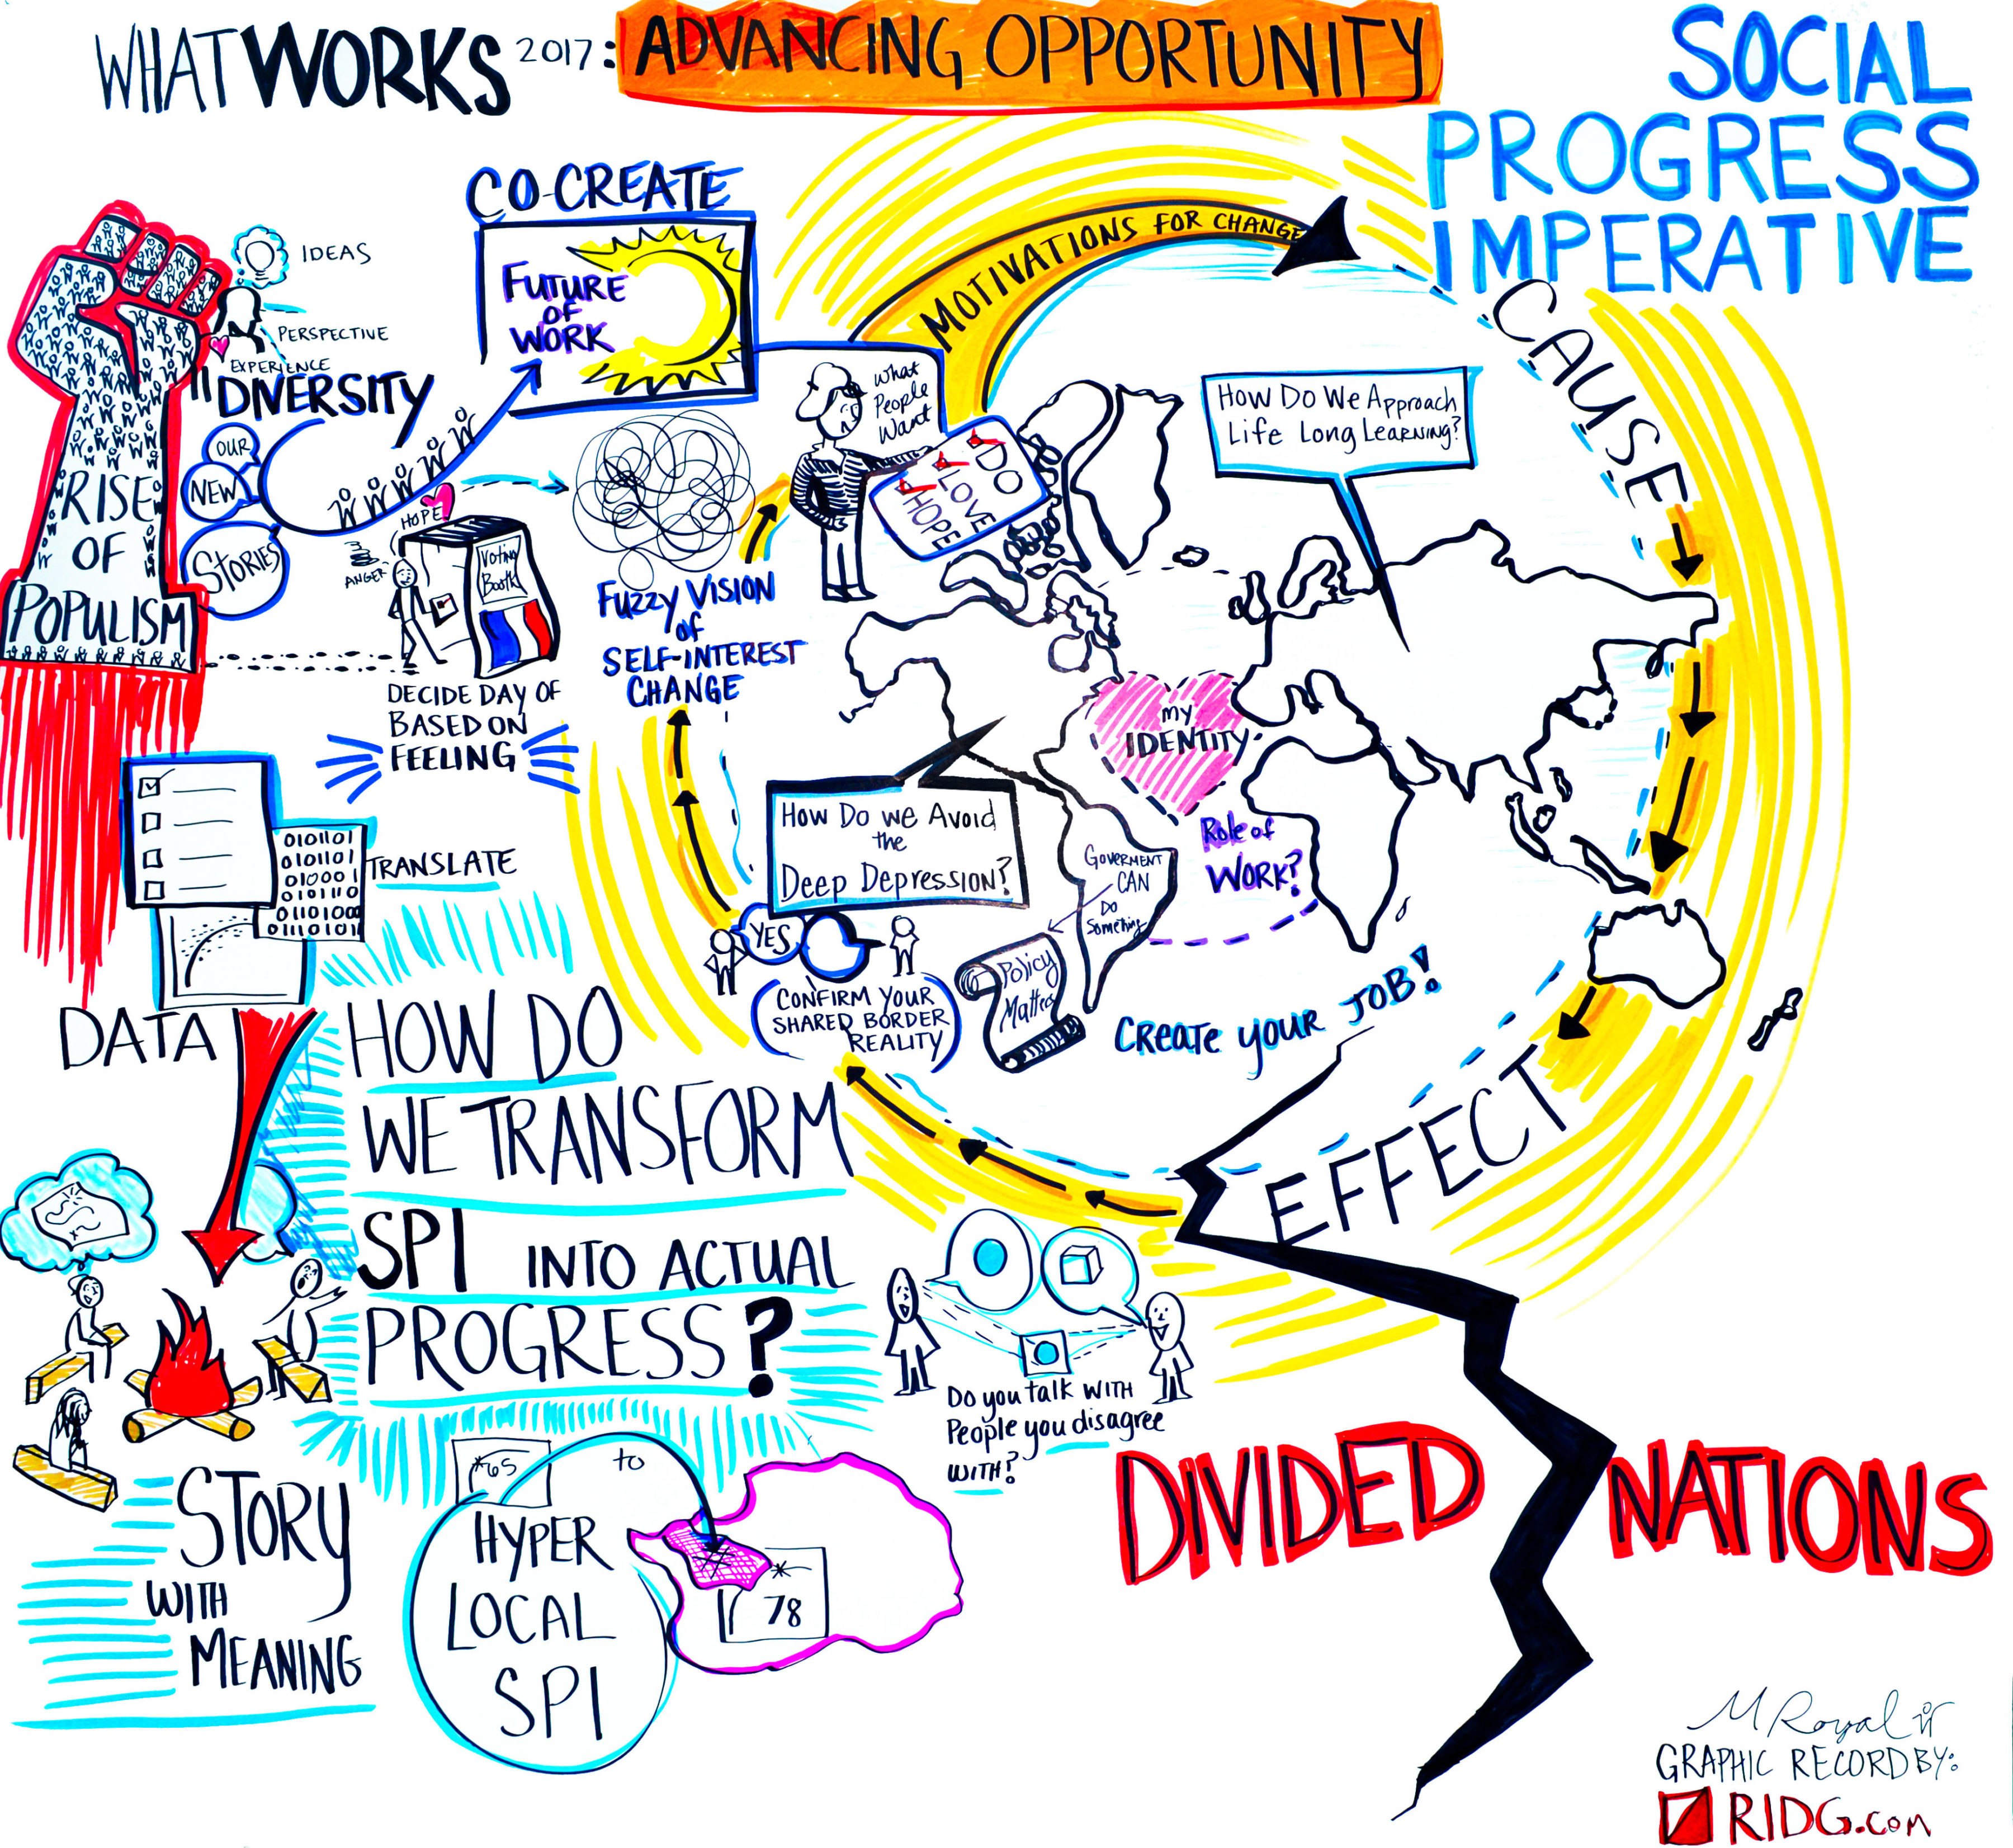 http://s12982.pcdn.co/wp-content/uploads/2017/05/Social-Progress-Index-Graphic-Records-5-e1493679270935.jpg